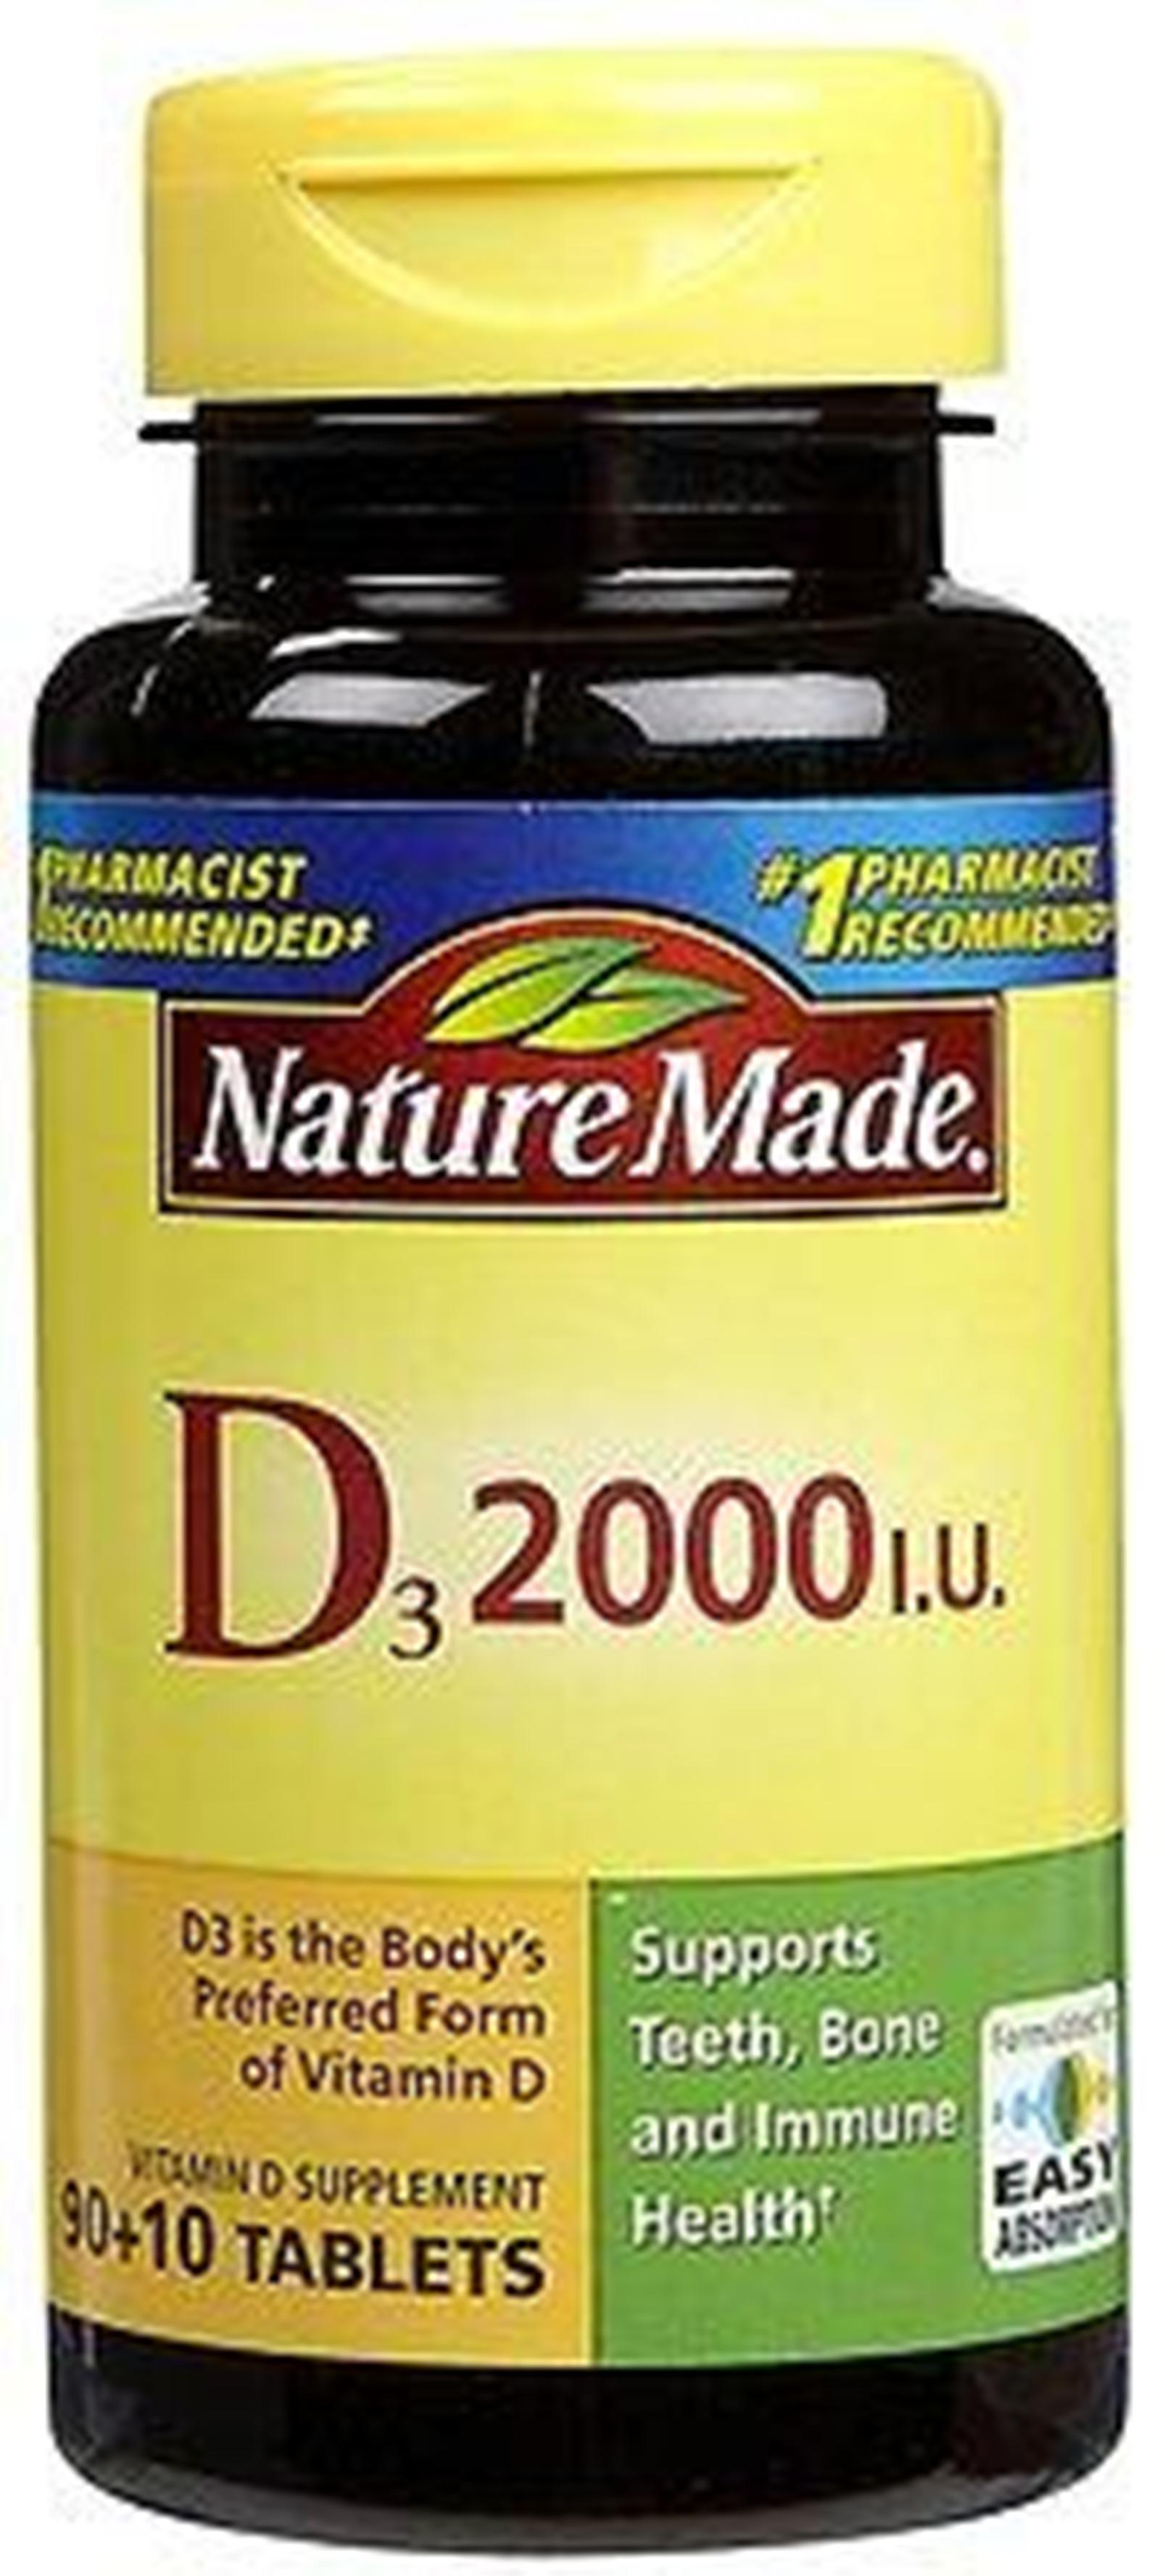 Nature Made Vitamin D3 2000 IU 100 Tablets